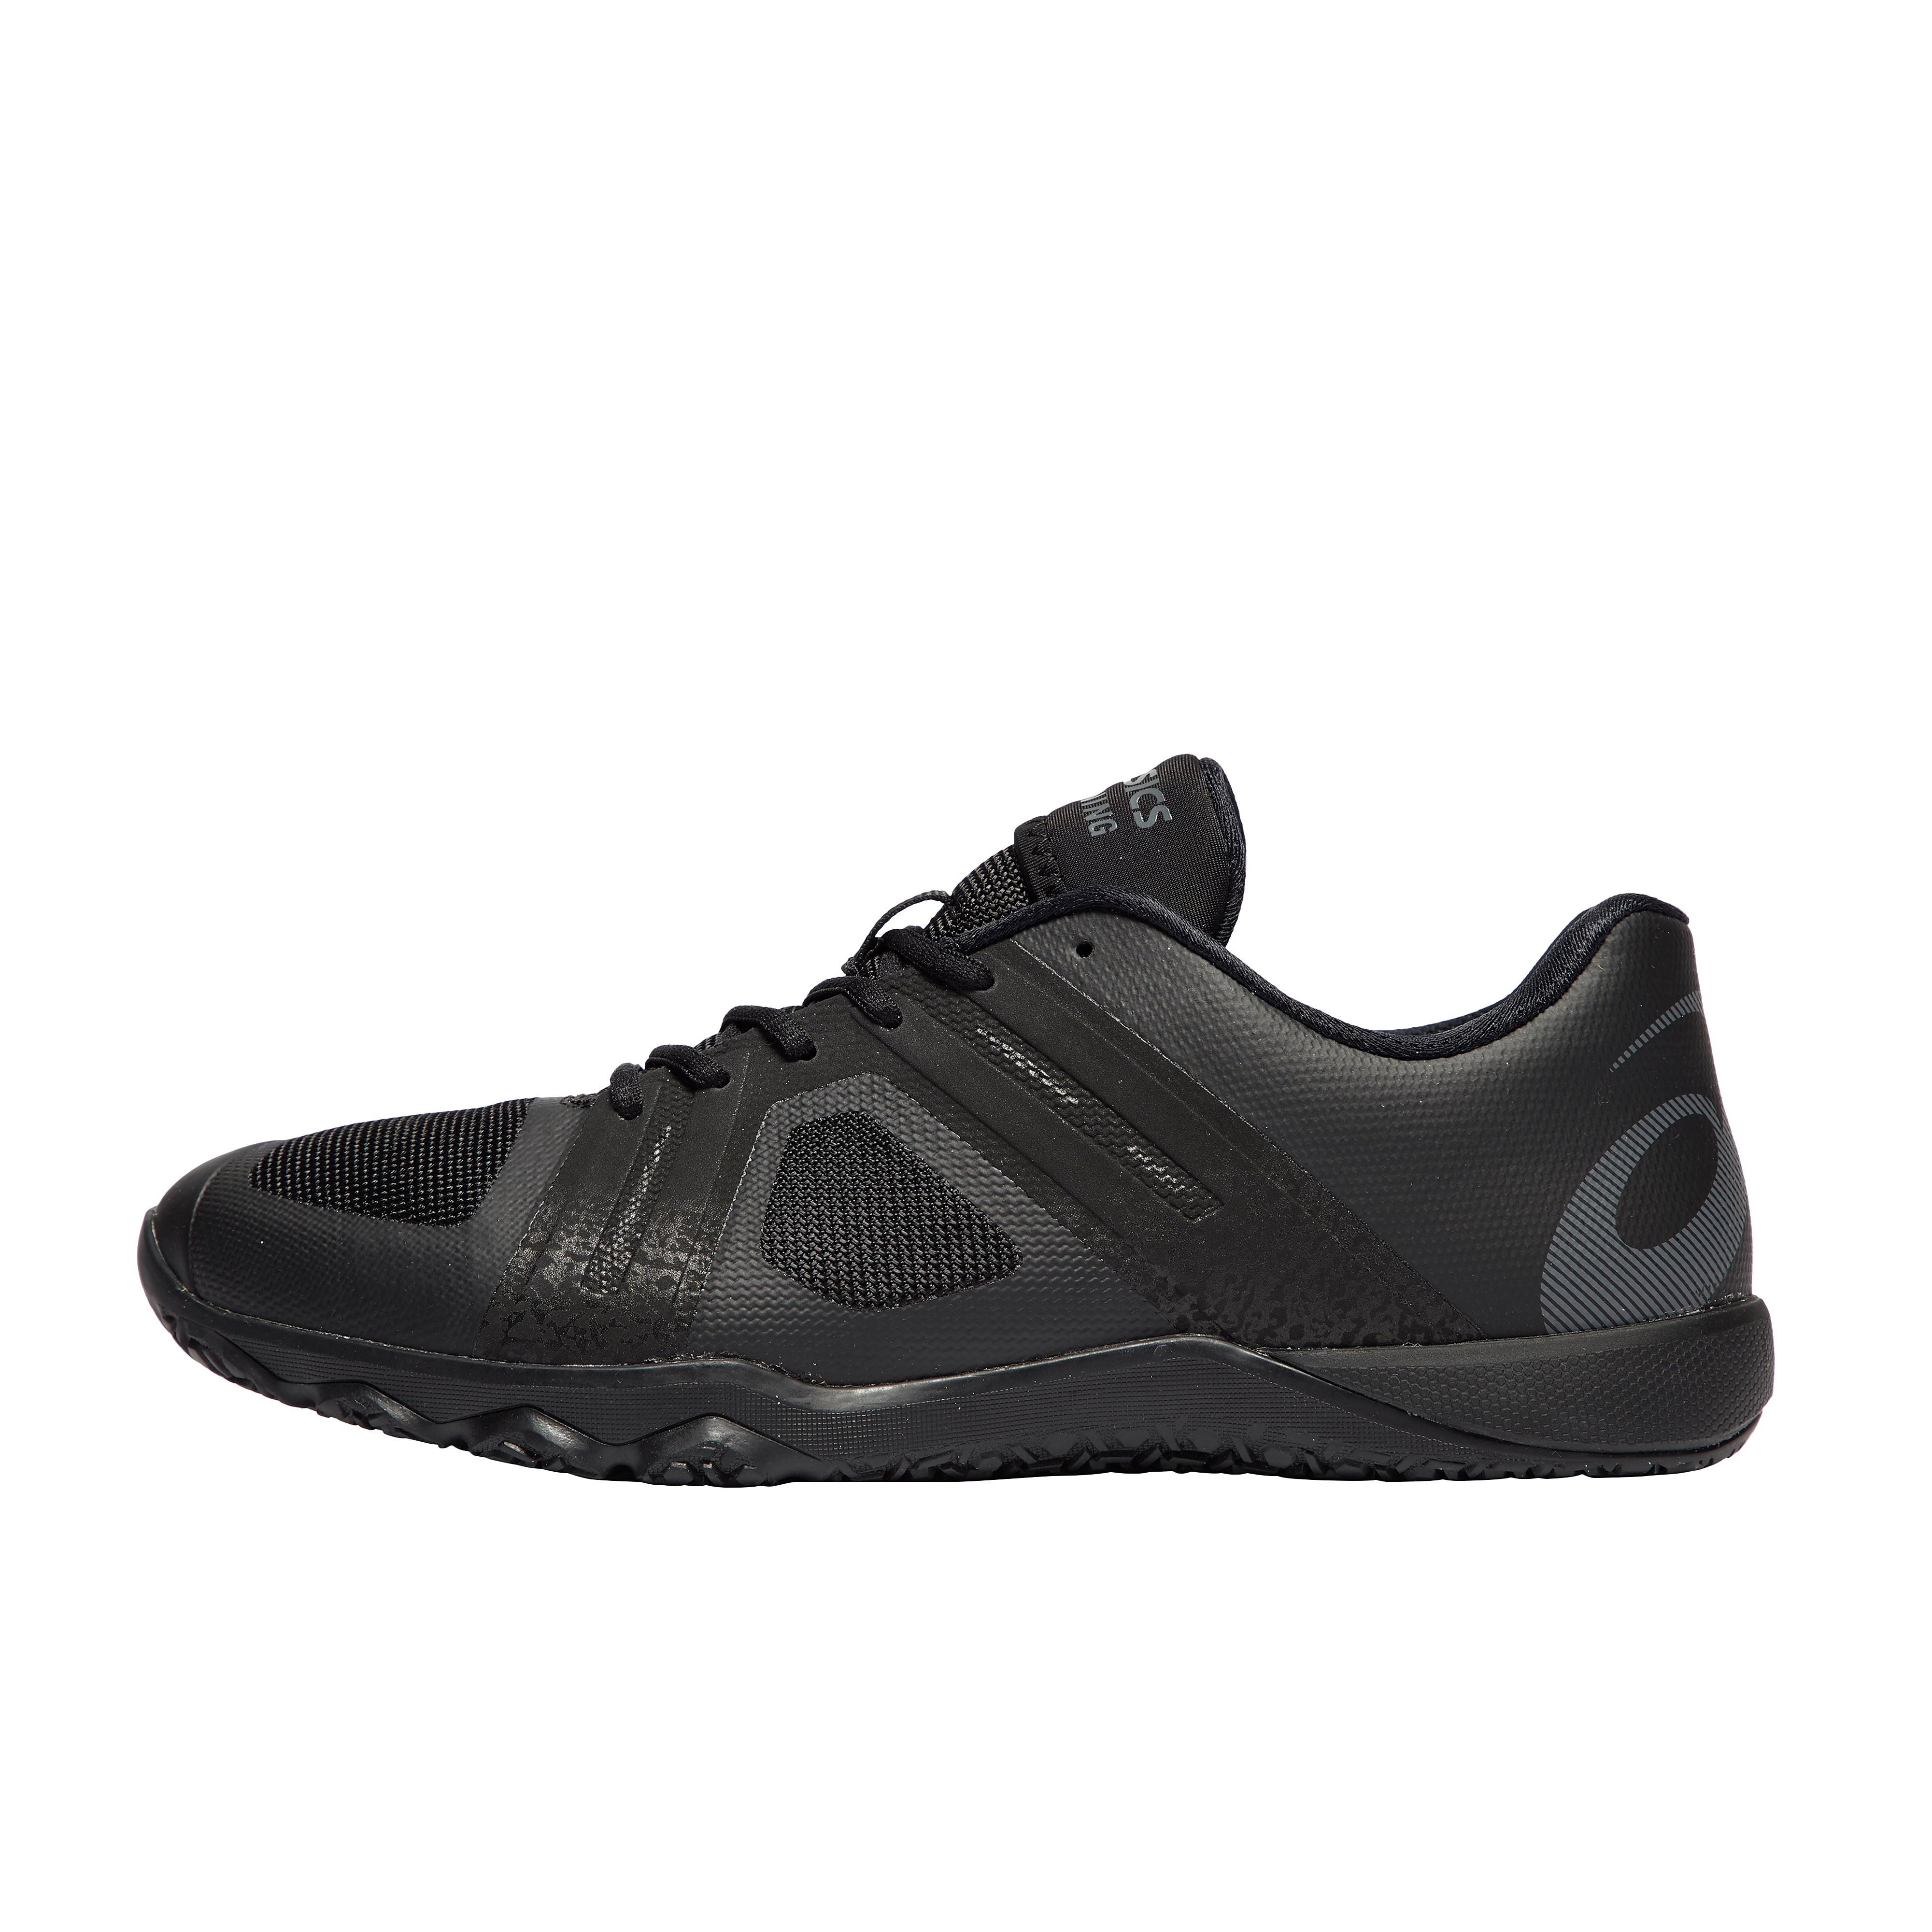 ASICS Conviction X2 Men's Training Shoes